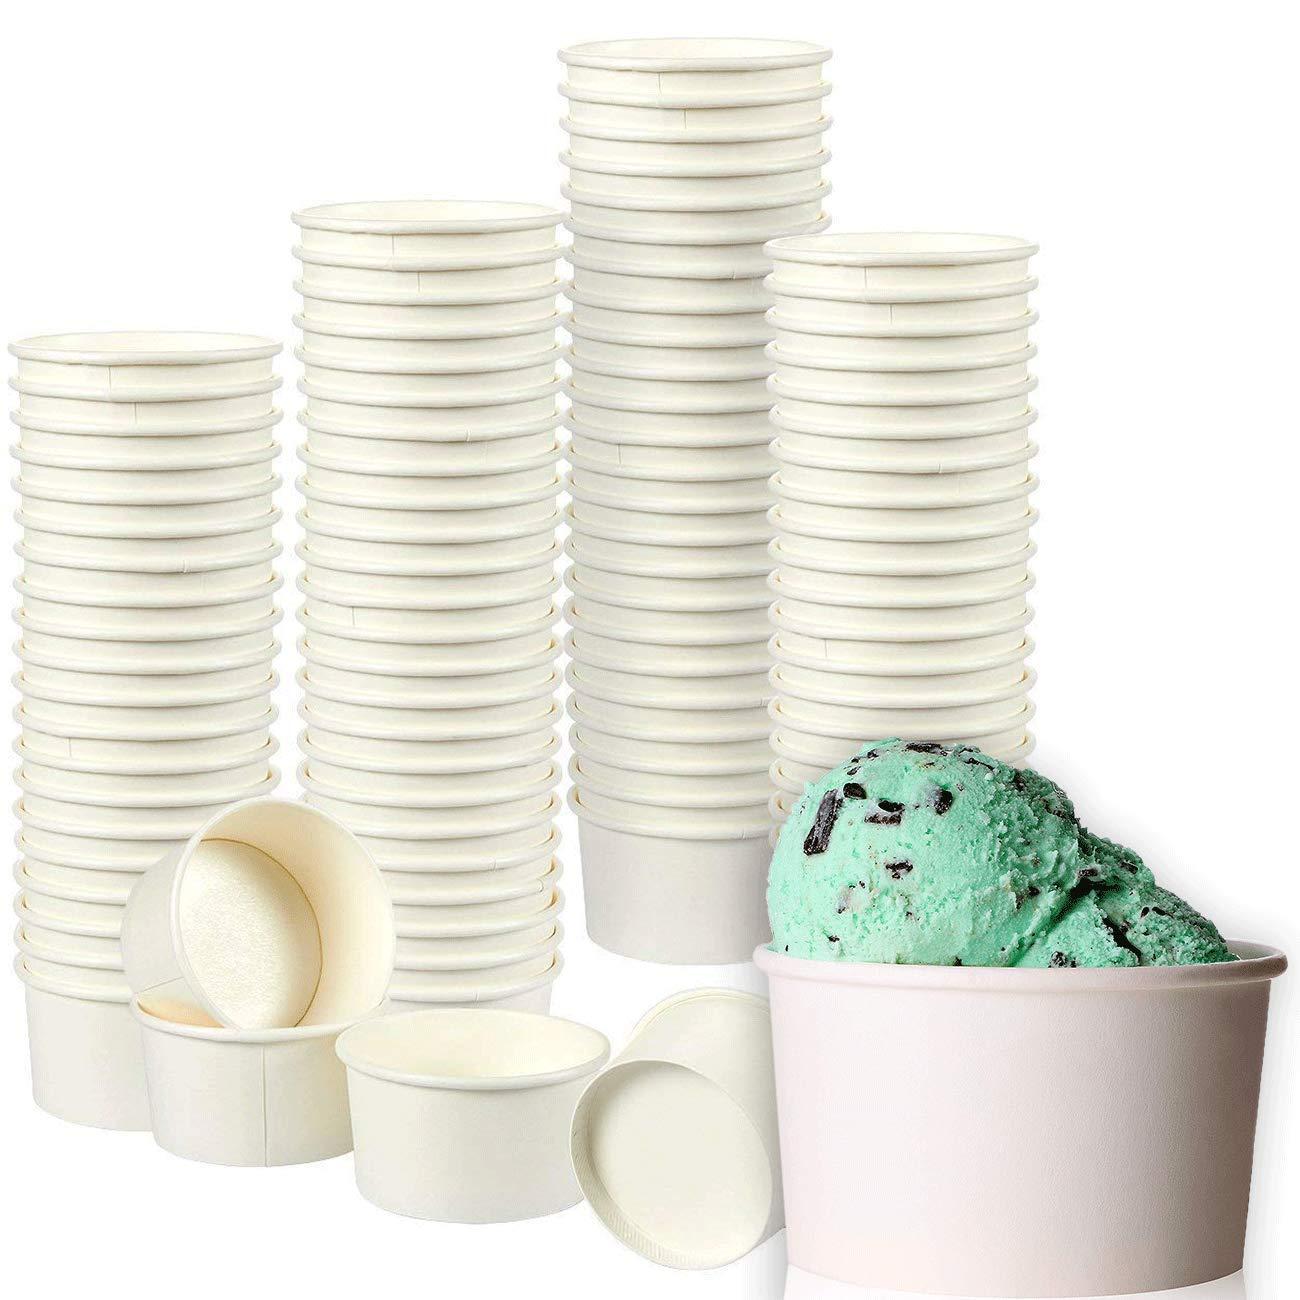 Juvale Ice Cream Sundae Cups - 100-Pack Disposable Paper Frozen Yogurt Dessert Bowls 8-Ounce, White